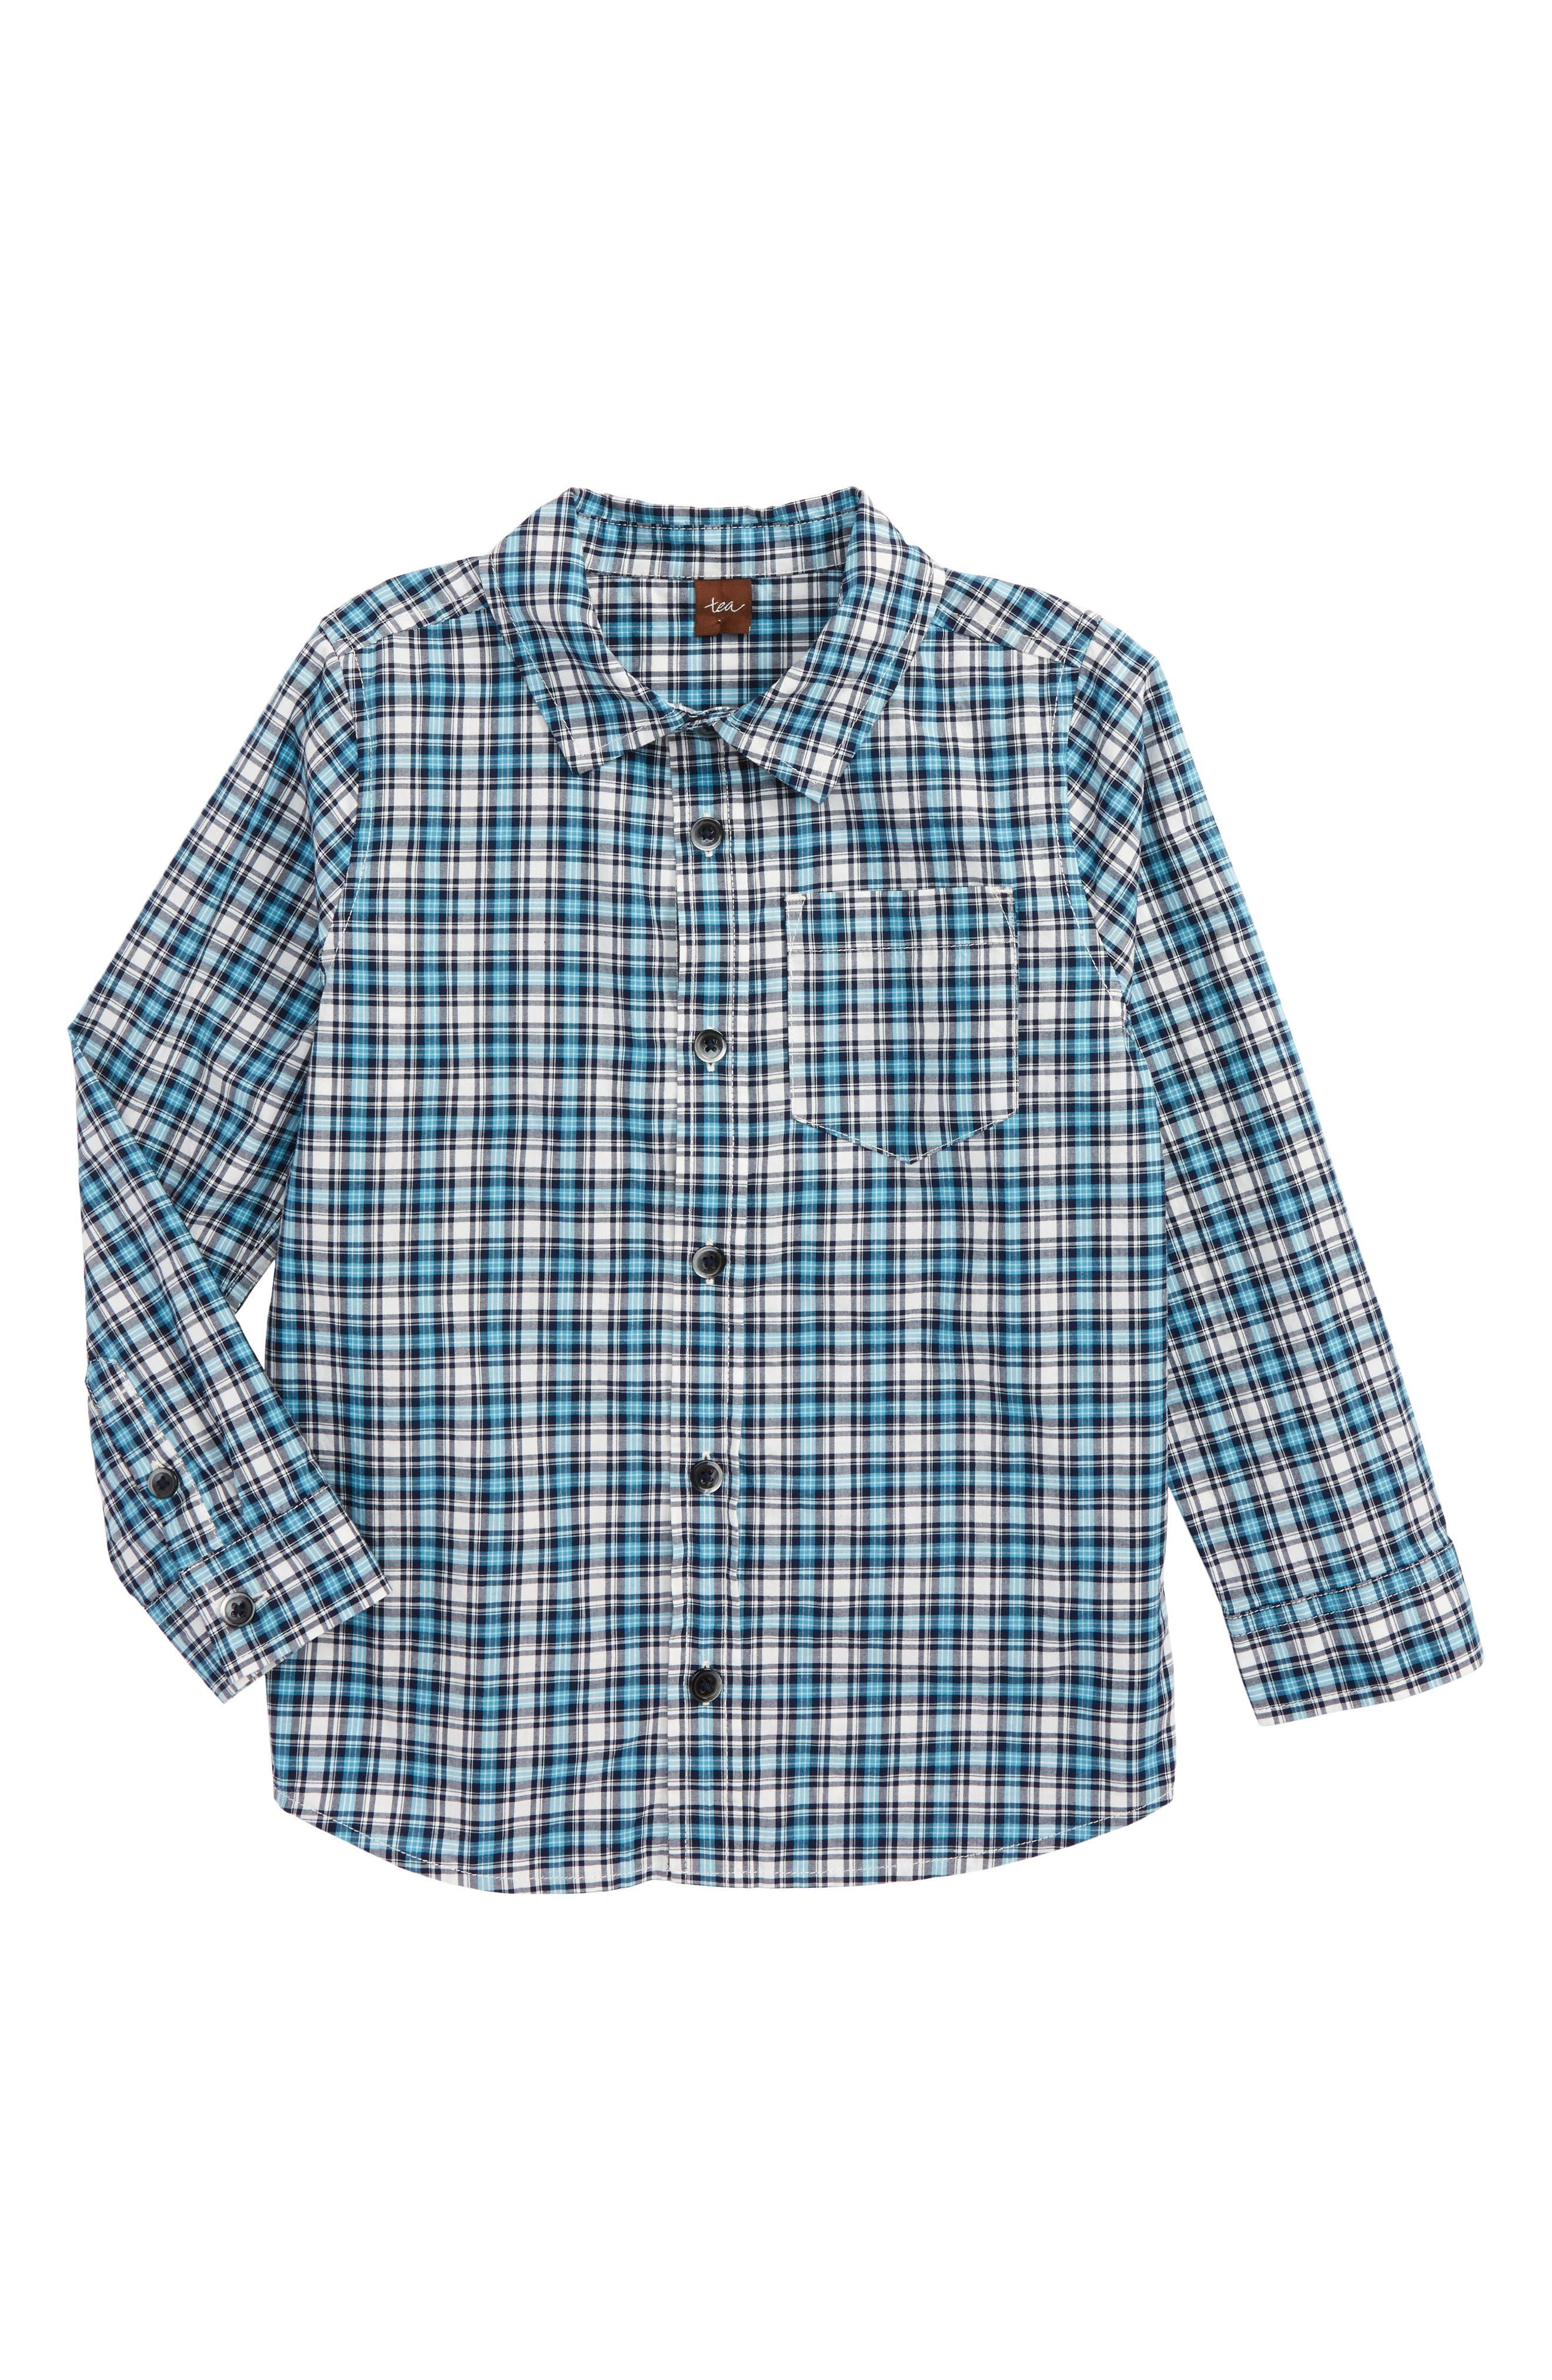 Heath Plaid Woven Shirt,                             Main thumbnail 1, color,                             103